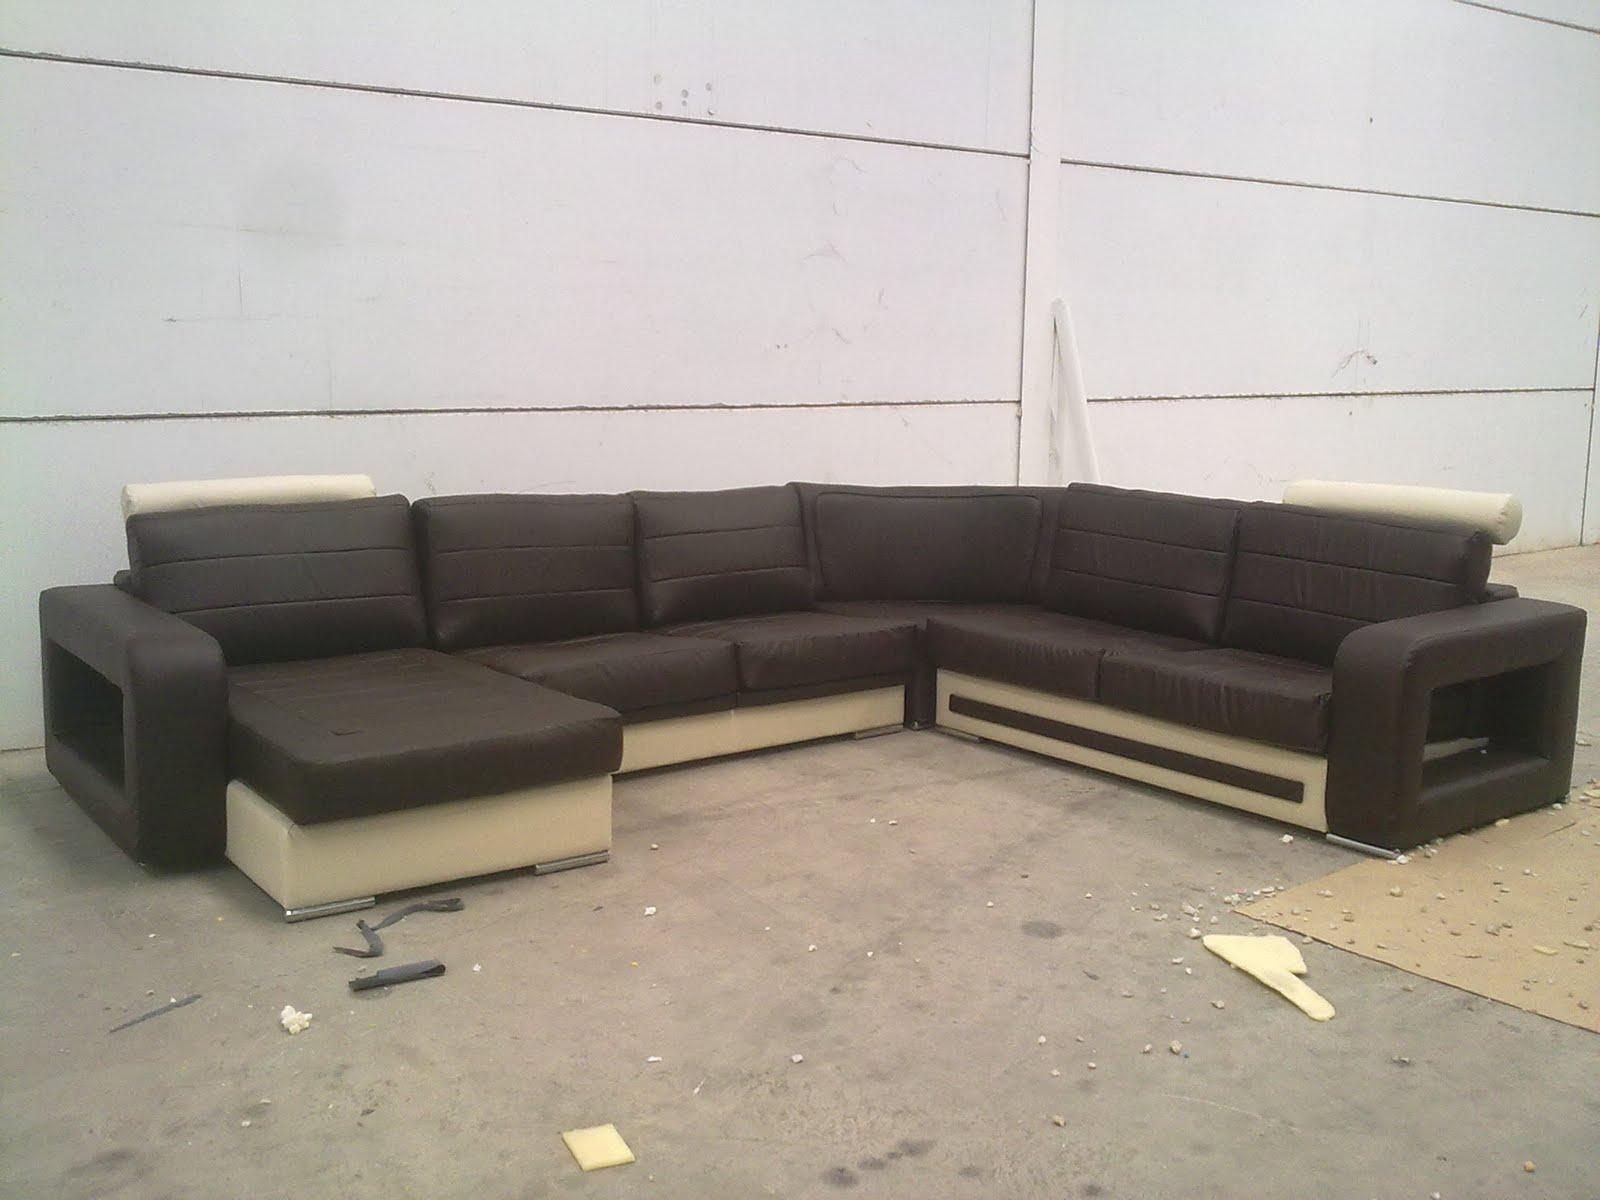 Sofas Chaise Longue Baratos Madrid John Lewis Felix Leather Lhf Corner Sofa Fabricantes De En Los